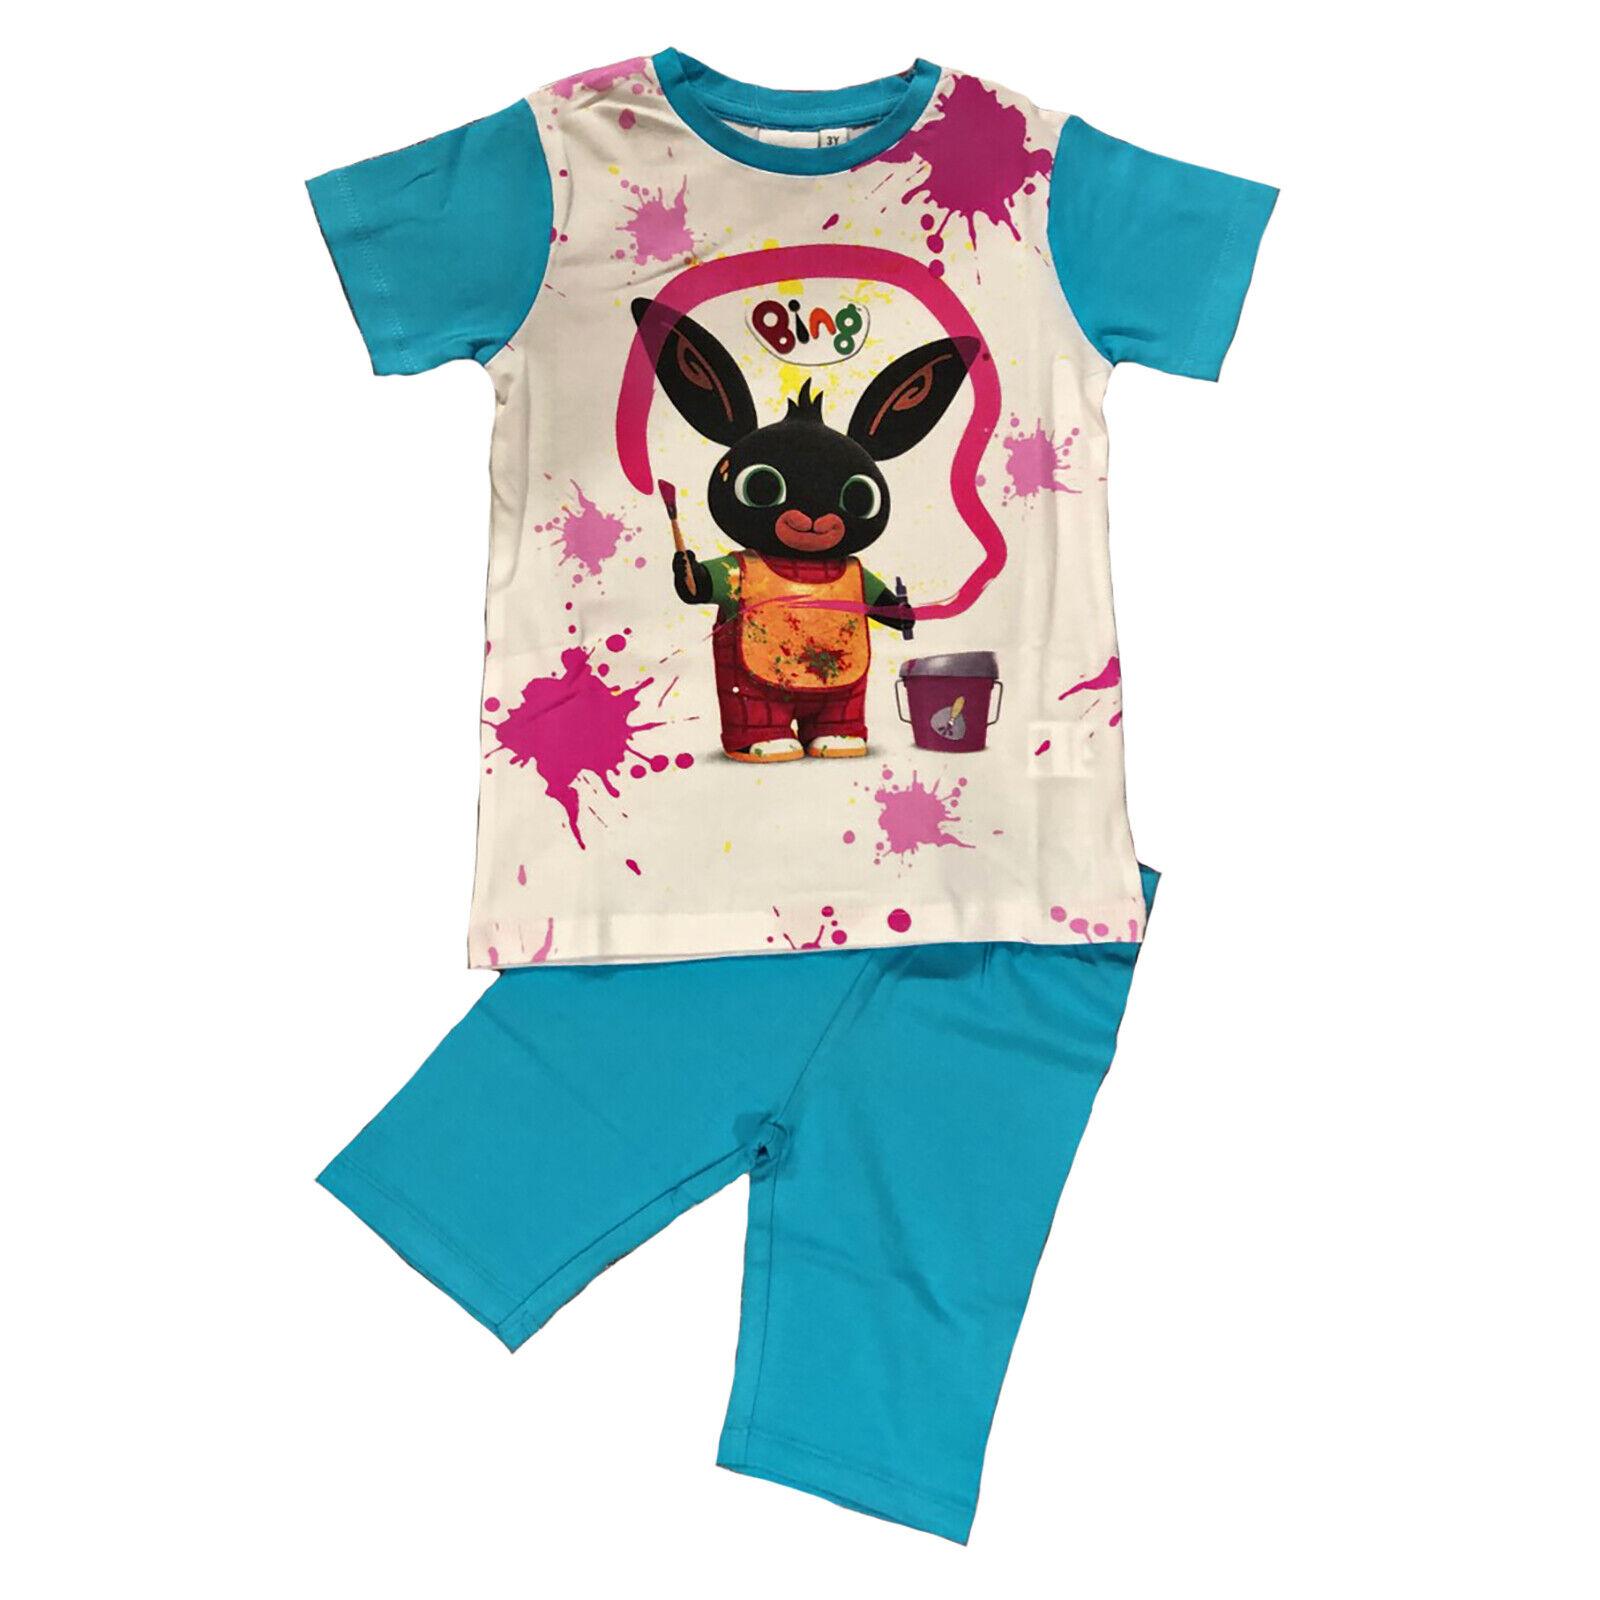 a037ee0aaaa2 Completo T-shirt con Leggings Bing 1 2 3 4 5 anni Bambina Estate ...